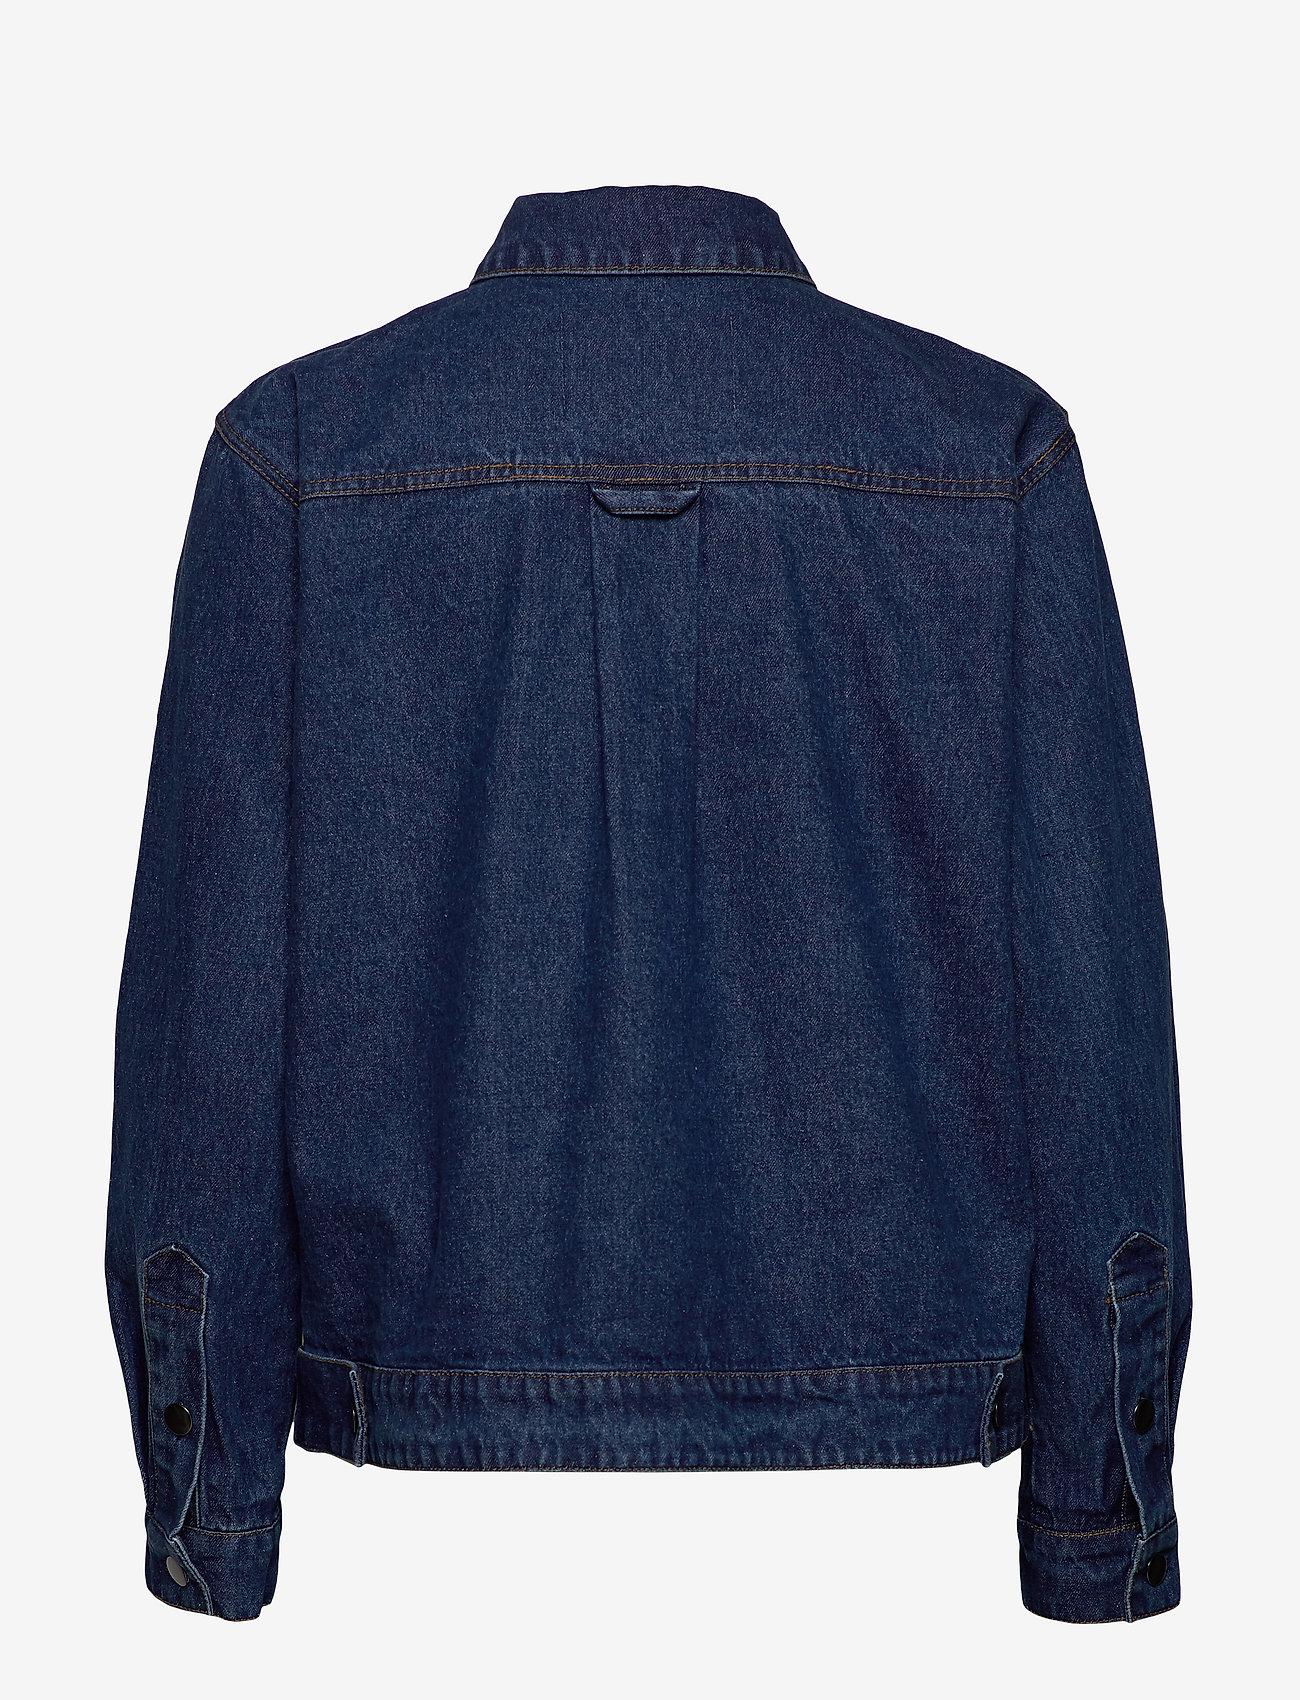 Stella Nova Sole - Jackor & Kappor Blue Jeans